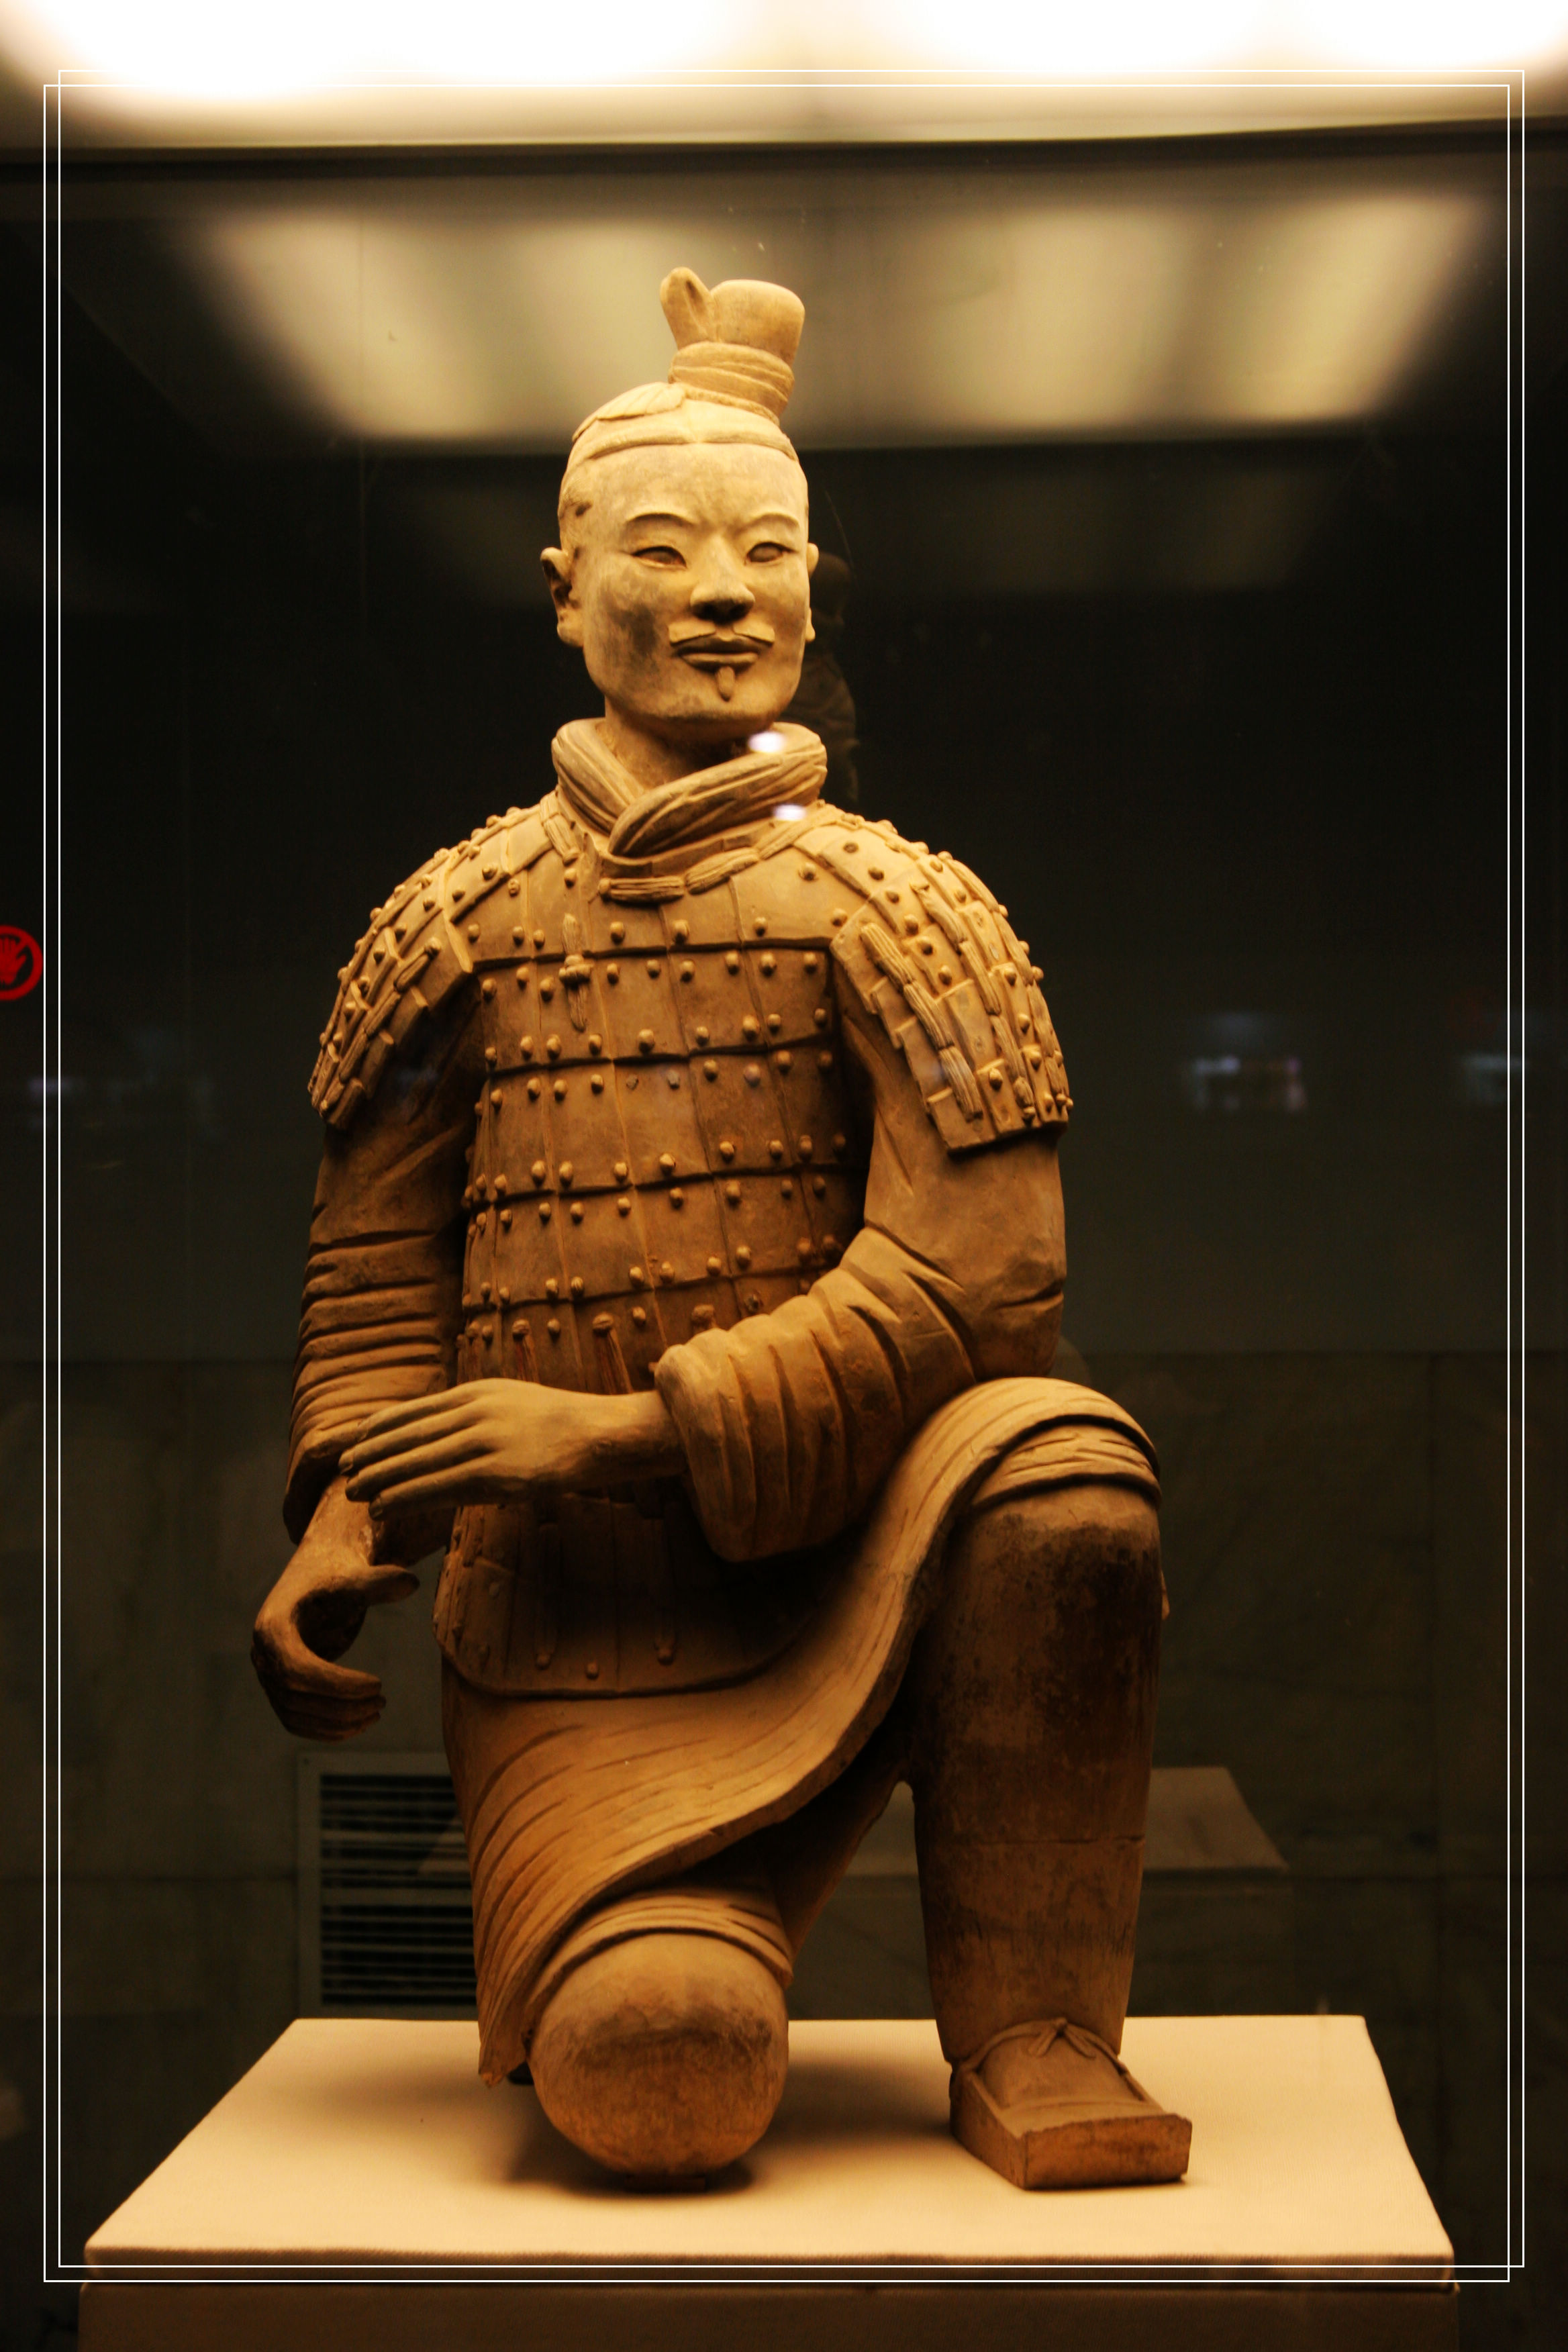 Terracotta_Army_5.jpg